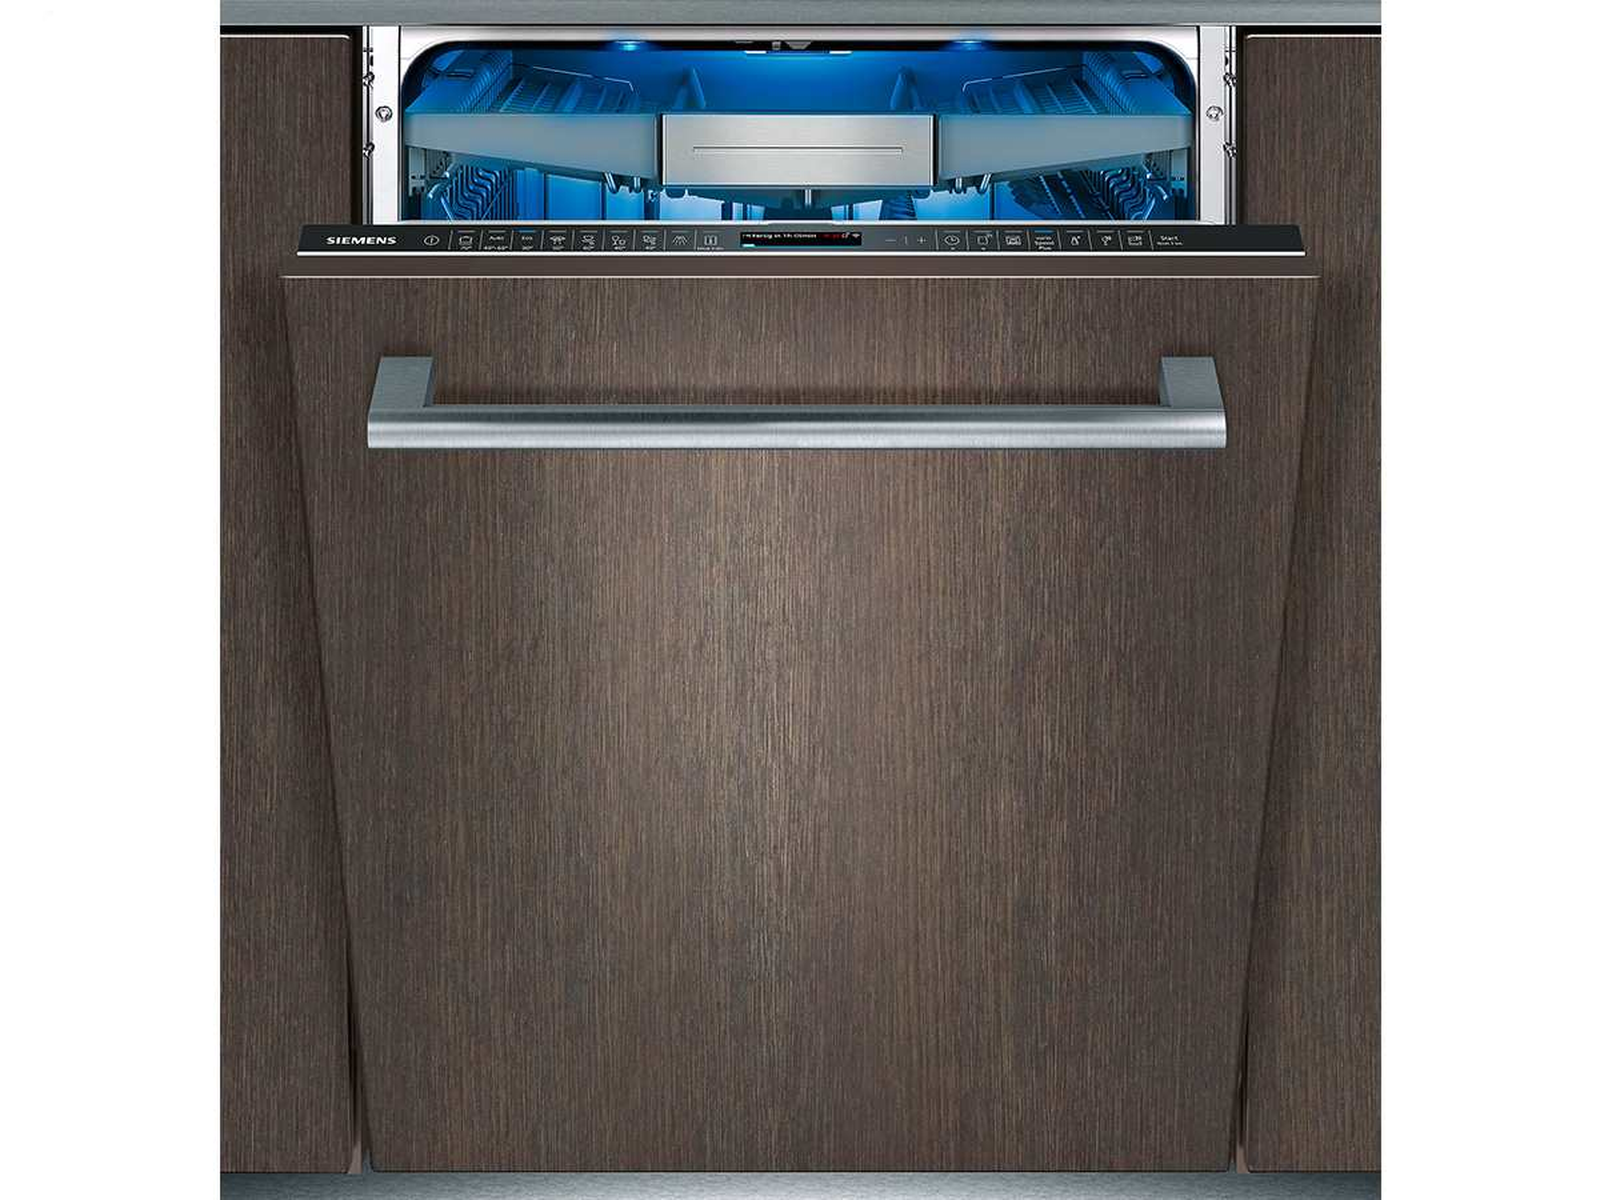 Gorenje Kühlschrank Brummt : Siemens sx678x36te vollintegrierbarer einbaugeschirrspüler xxl